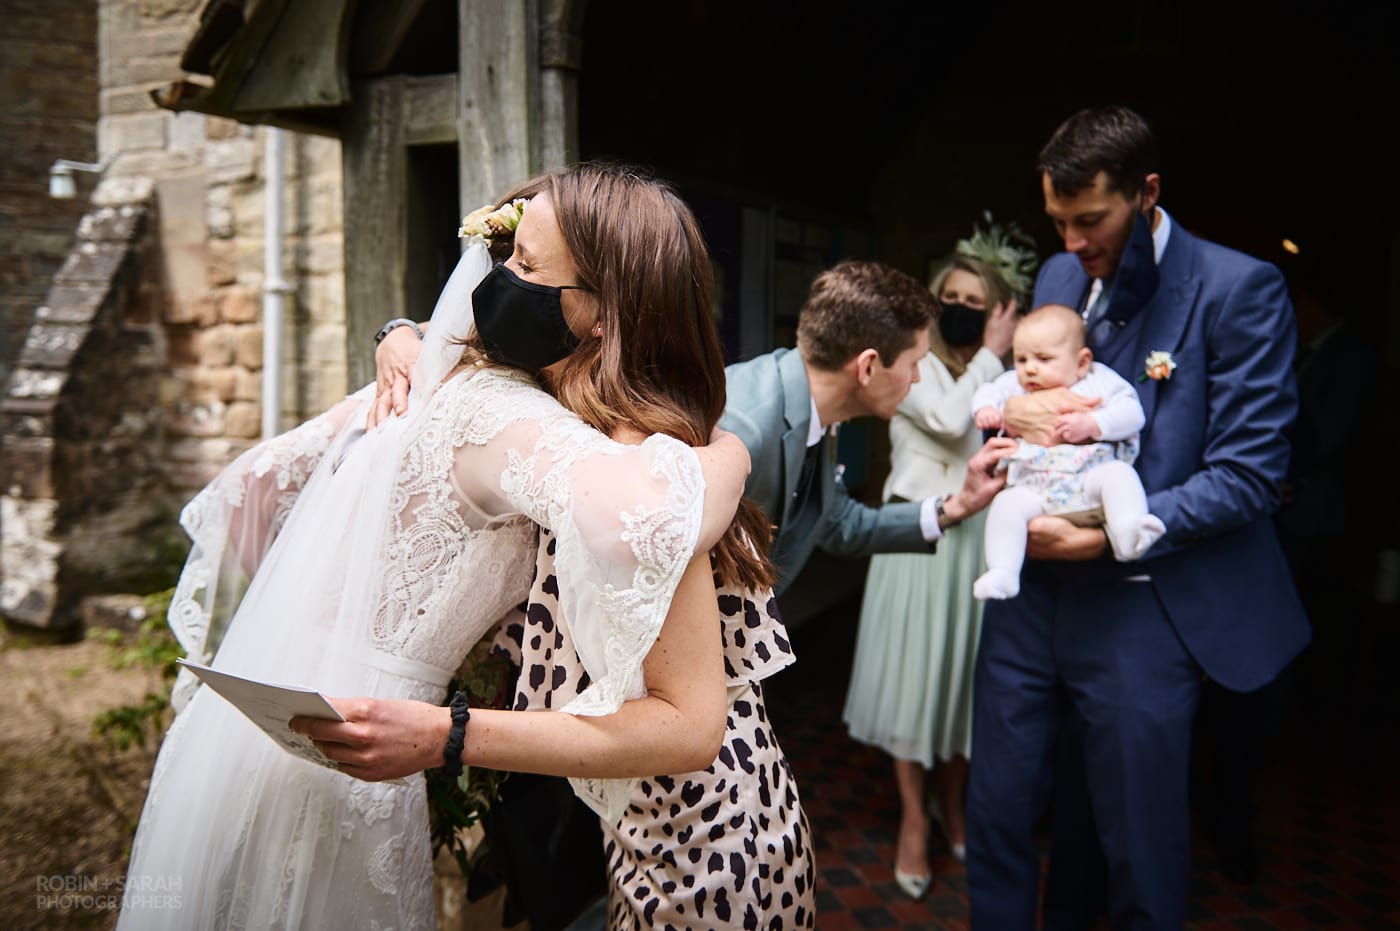 Bride hugs wedding guest after church ceremony